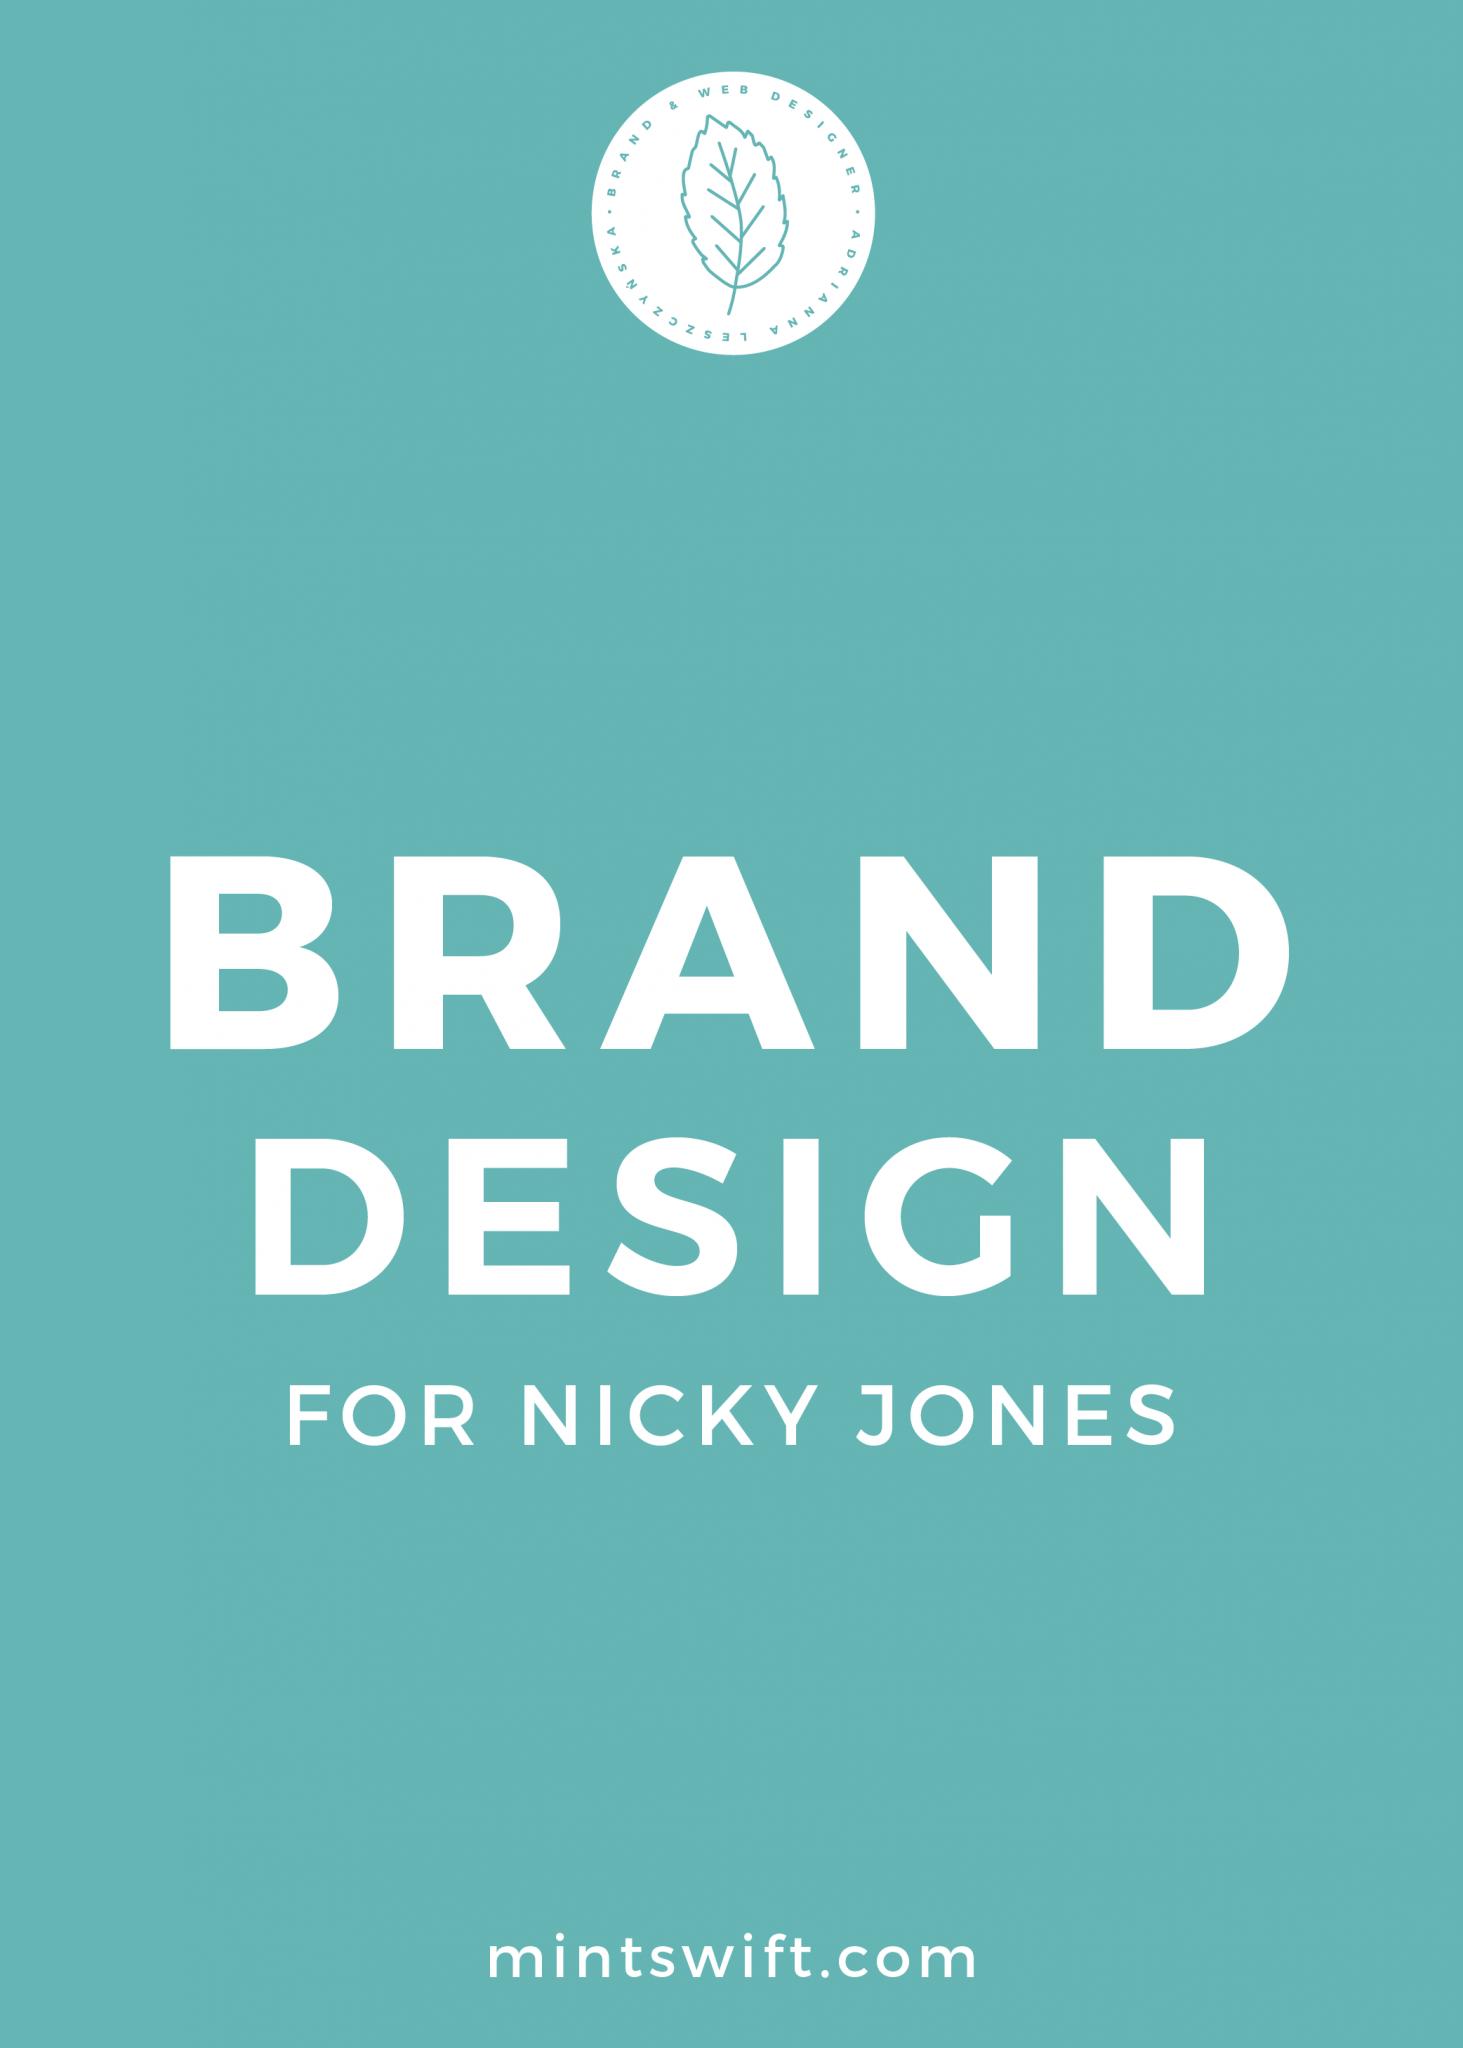 Brand Design for Nicky Jones - MintSwift